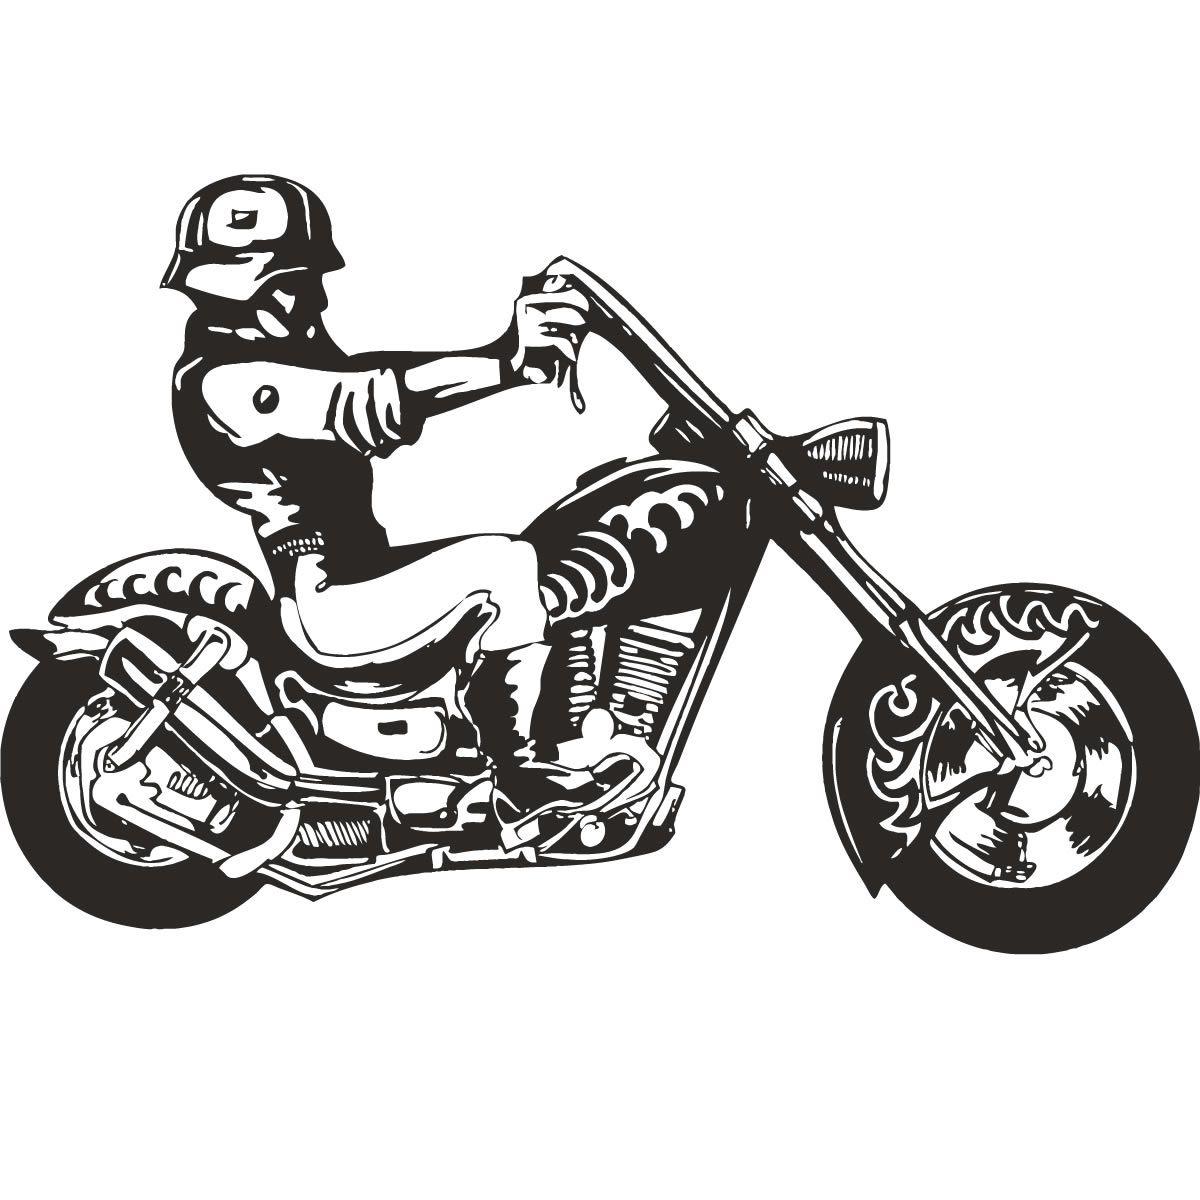 Hells Angel Biker Motorbike Wall Art Decal Stickers